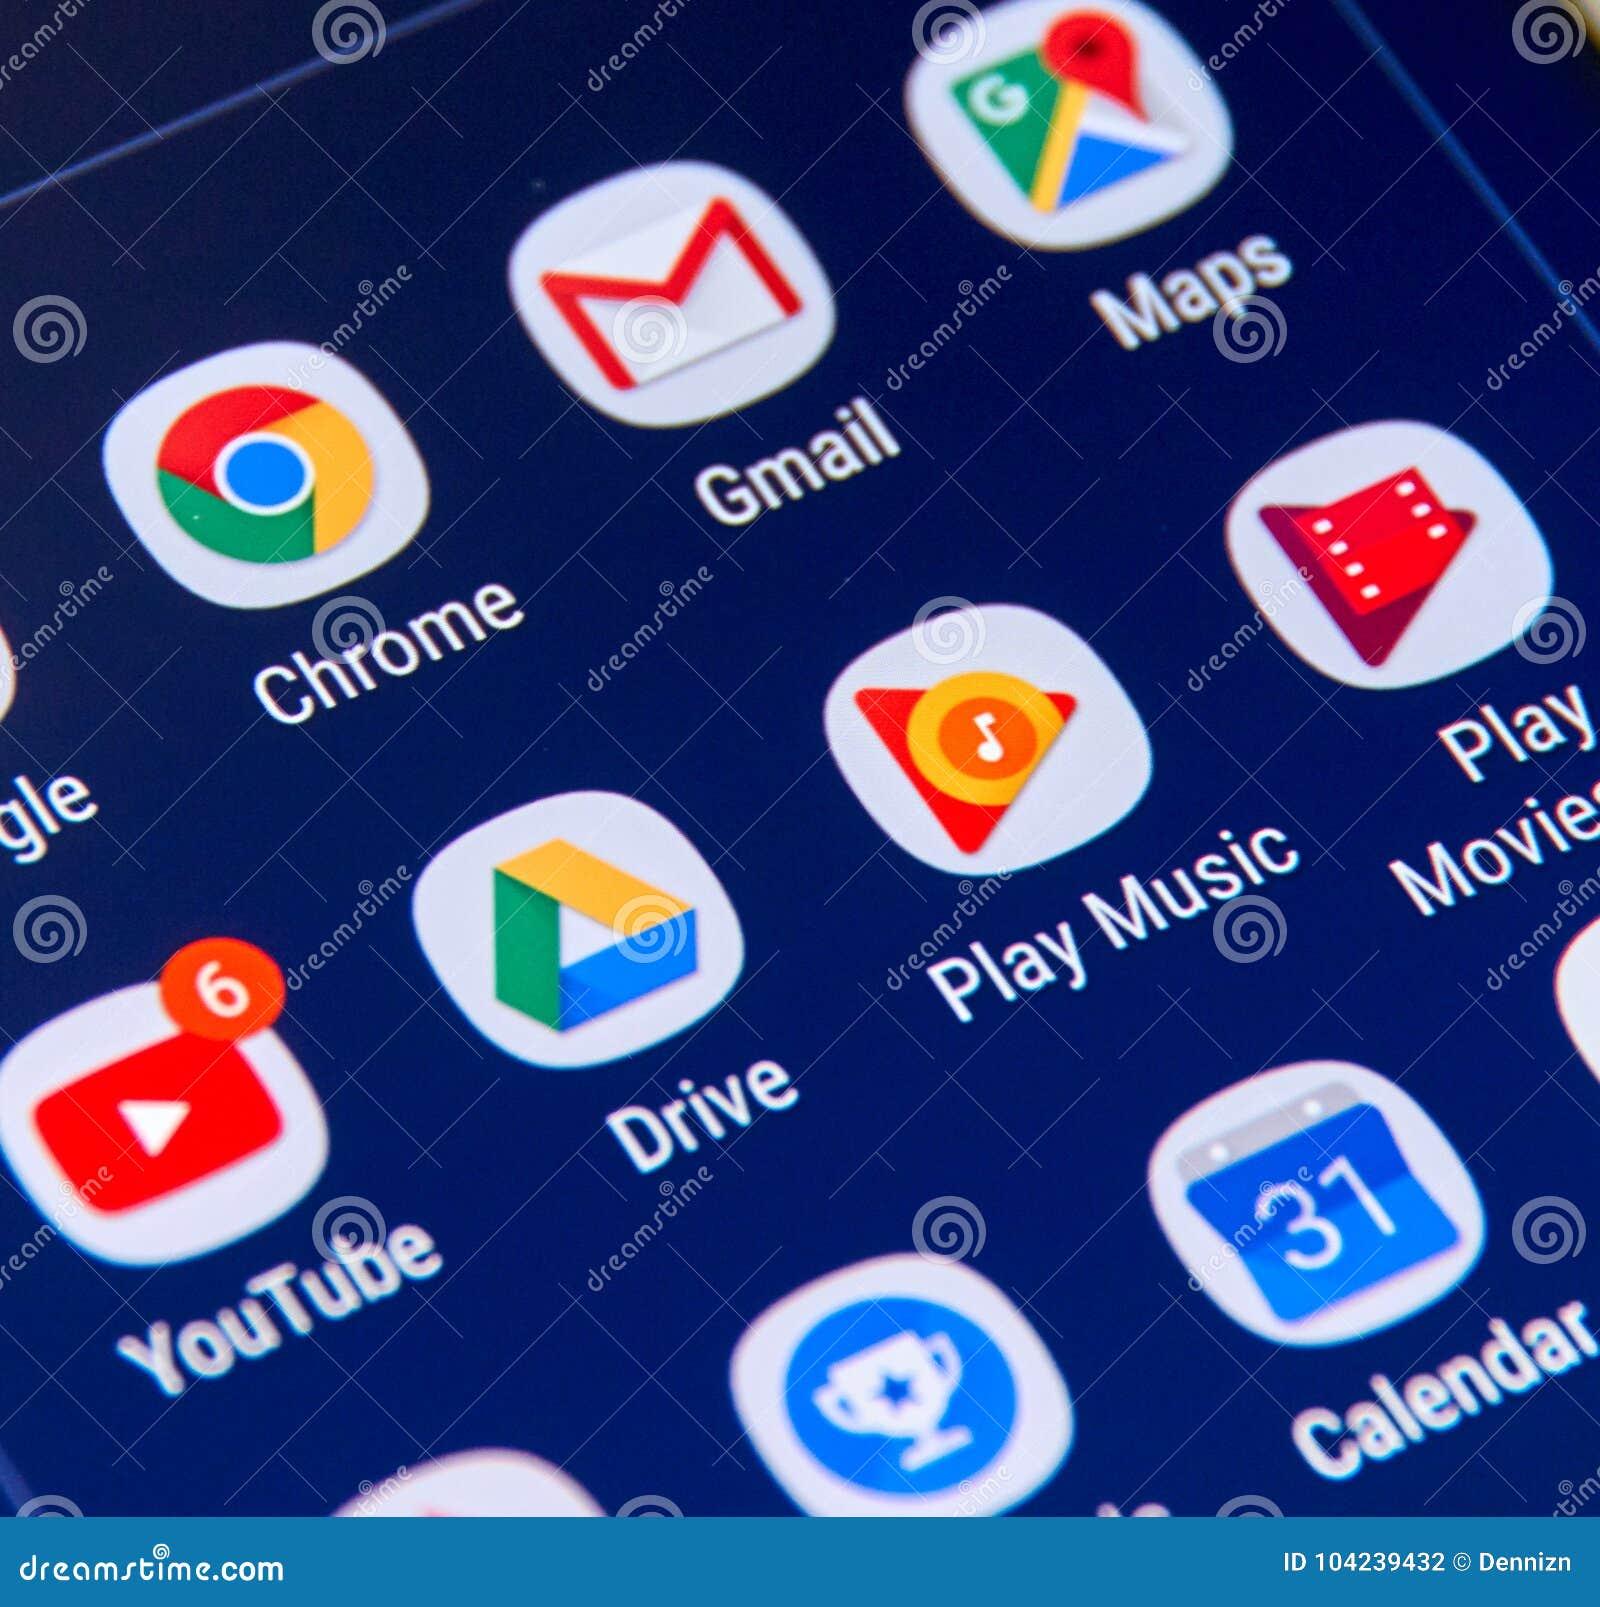 musik download app samsung s8